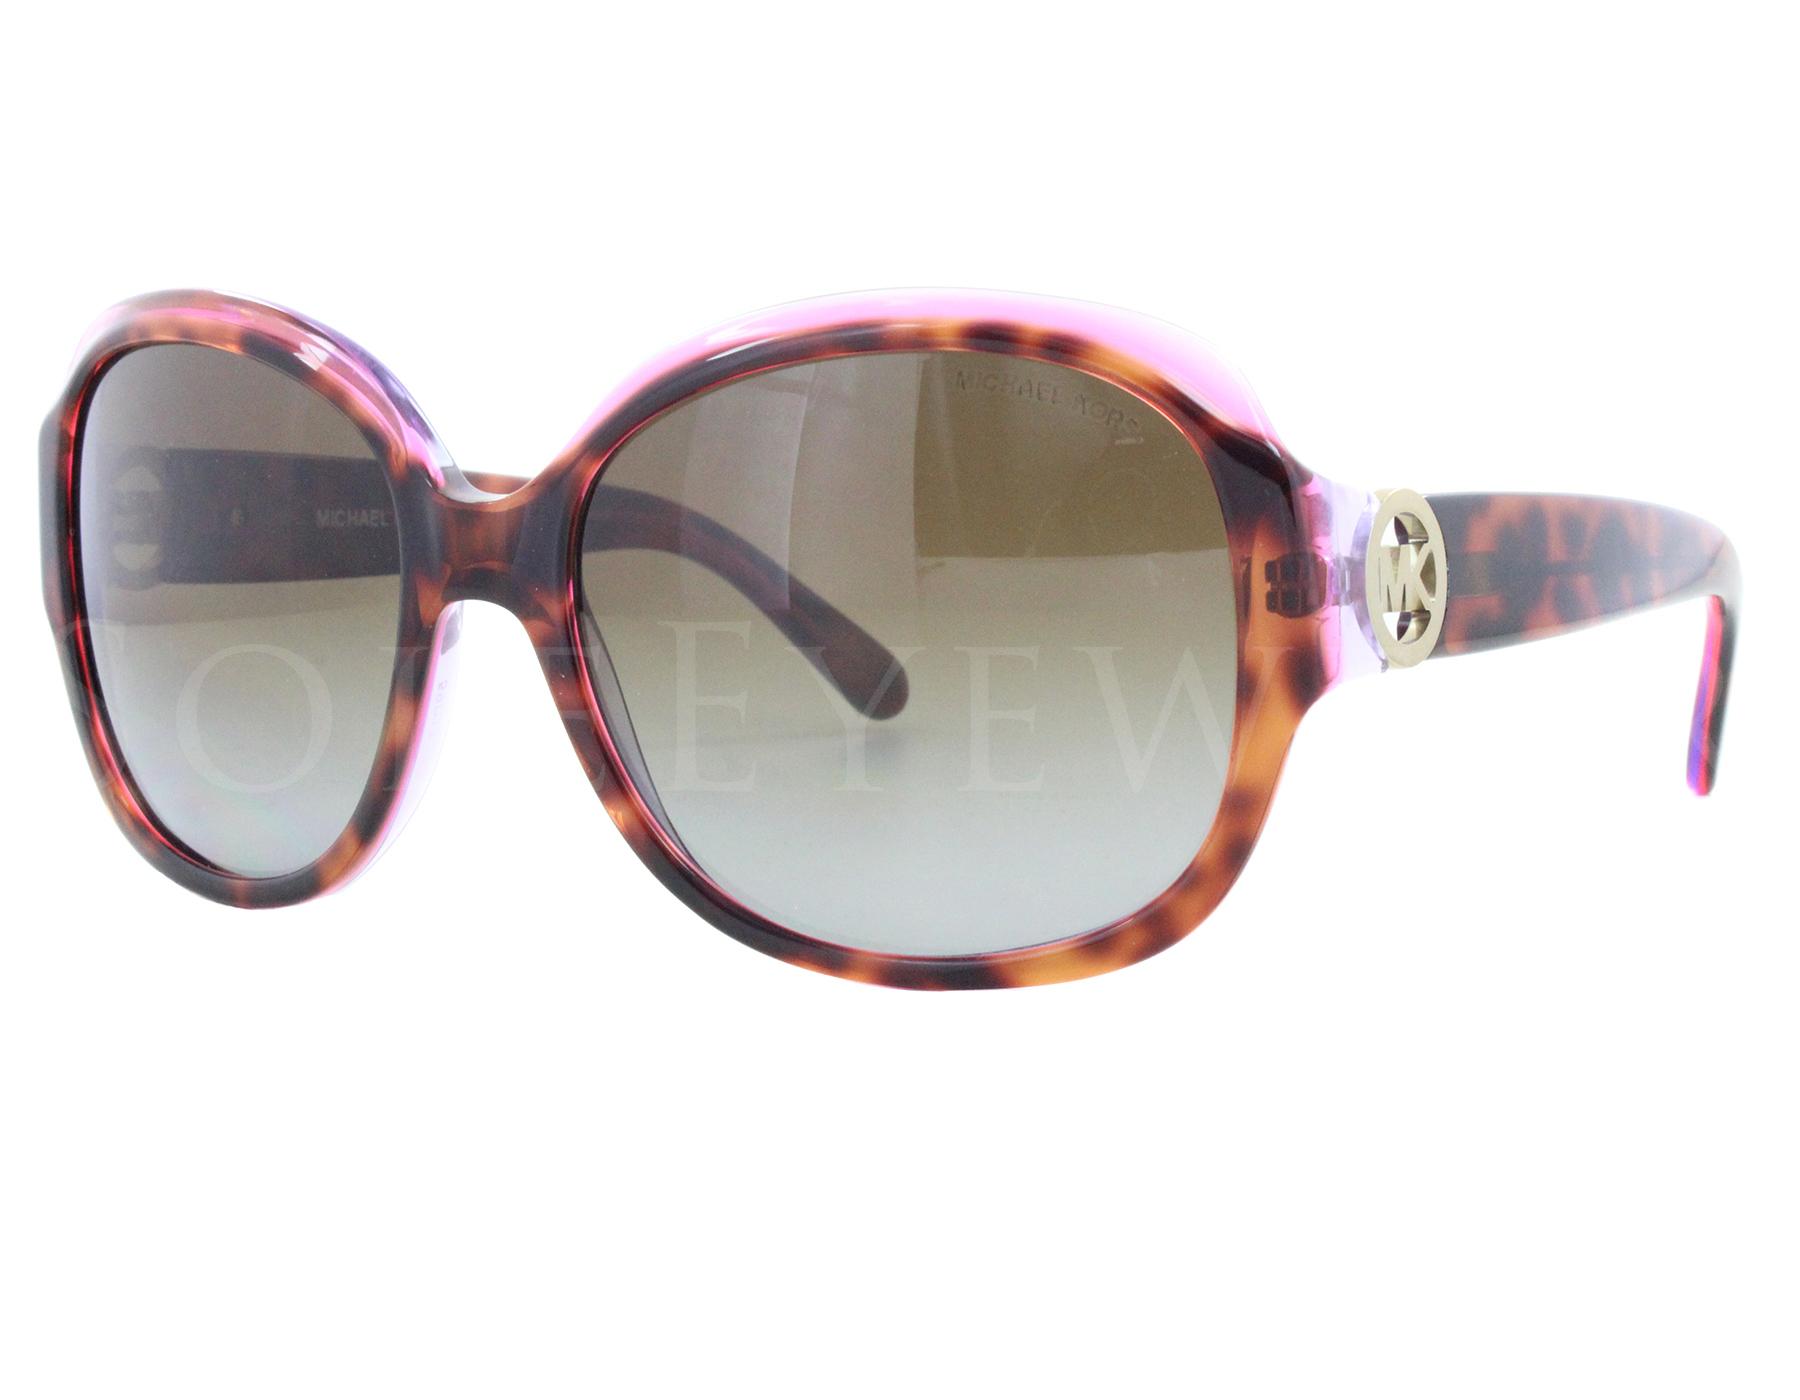 Details about NEW Michael Kors MK6004 3003T5 Kauai Tortoise Brown Polarized  Sunglasses ca7feefbaa